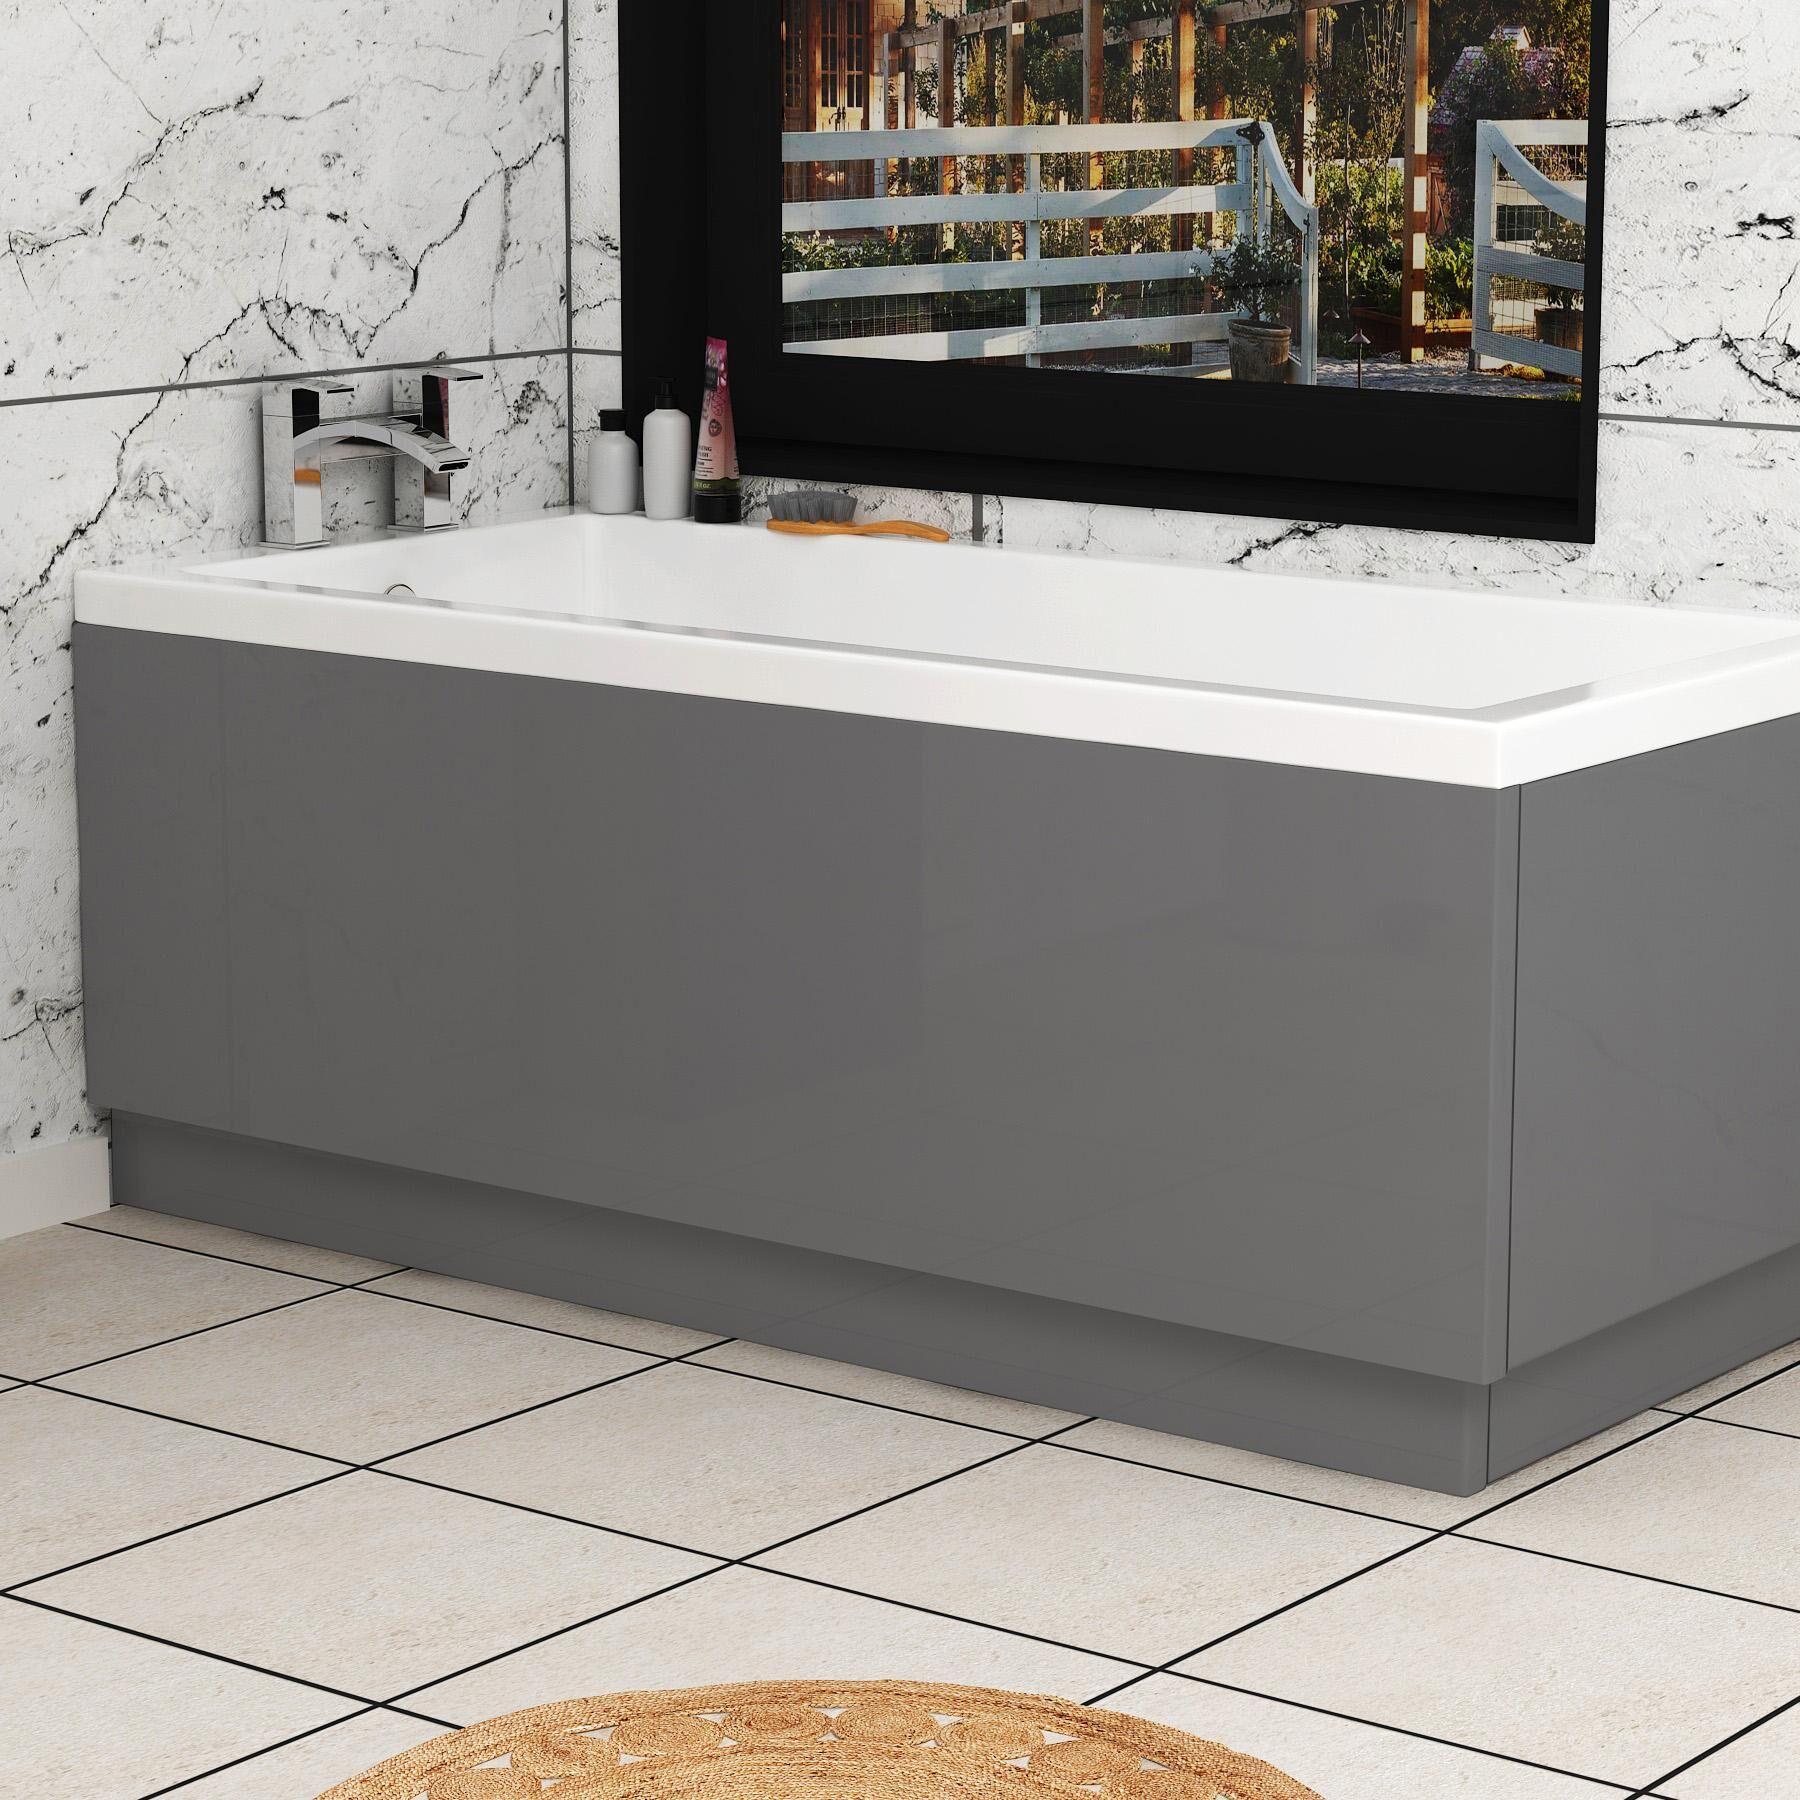 Royal Bathrooms Turin 1700mm Indigo Grey Gloss MDF Front Bath Panel - Wooden